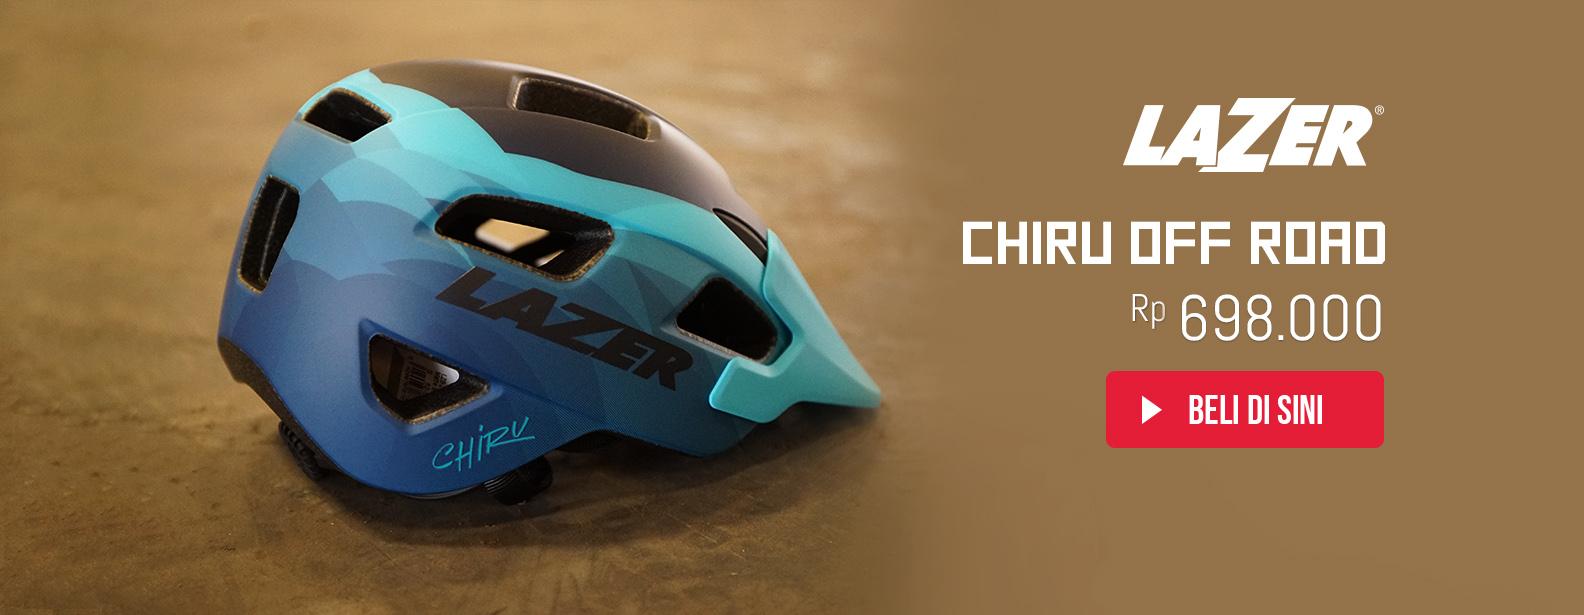 Lazer Helm Sepeda Chiru Off Road